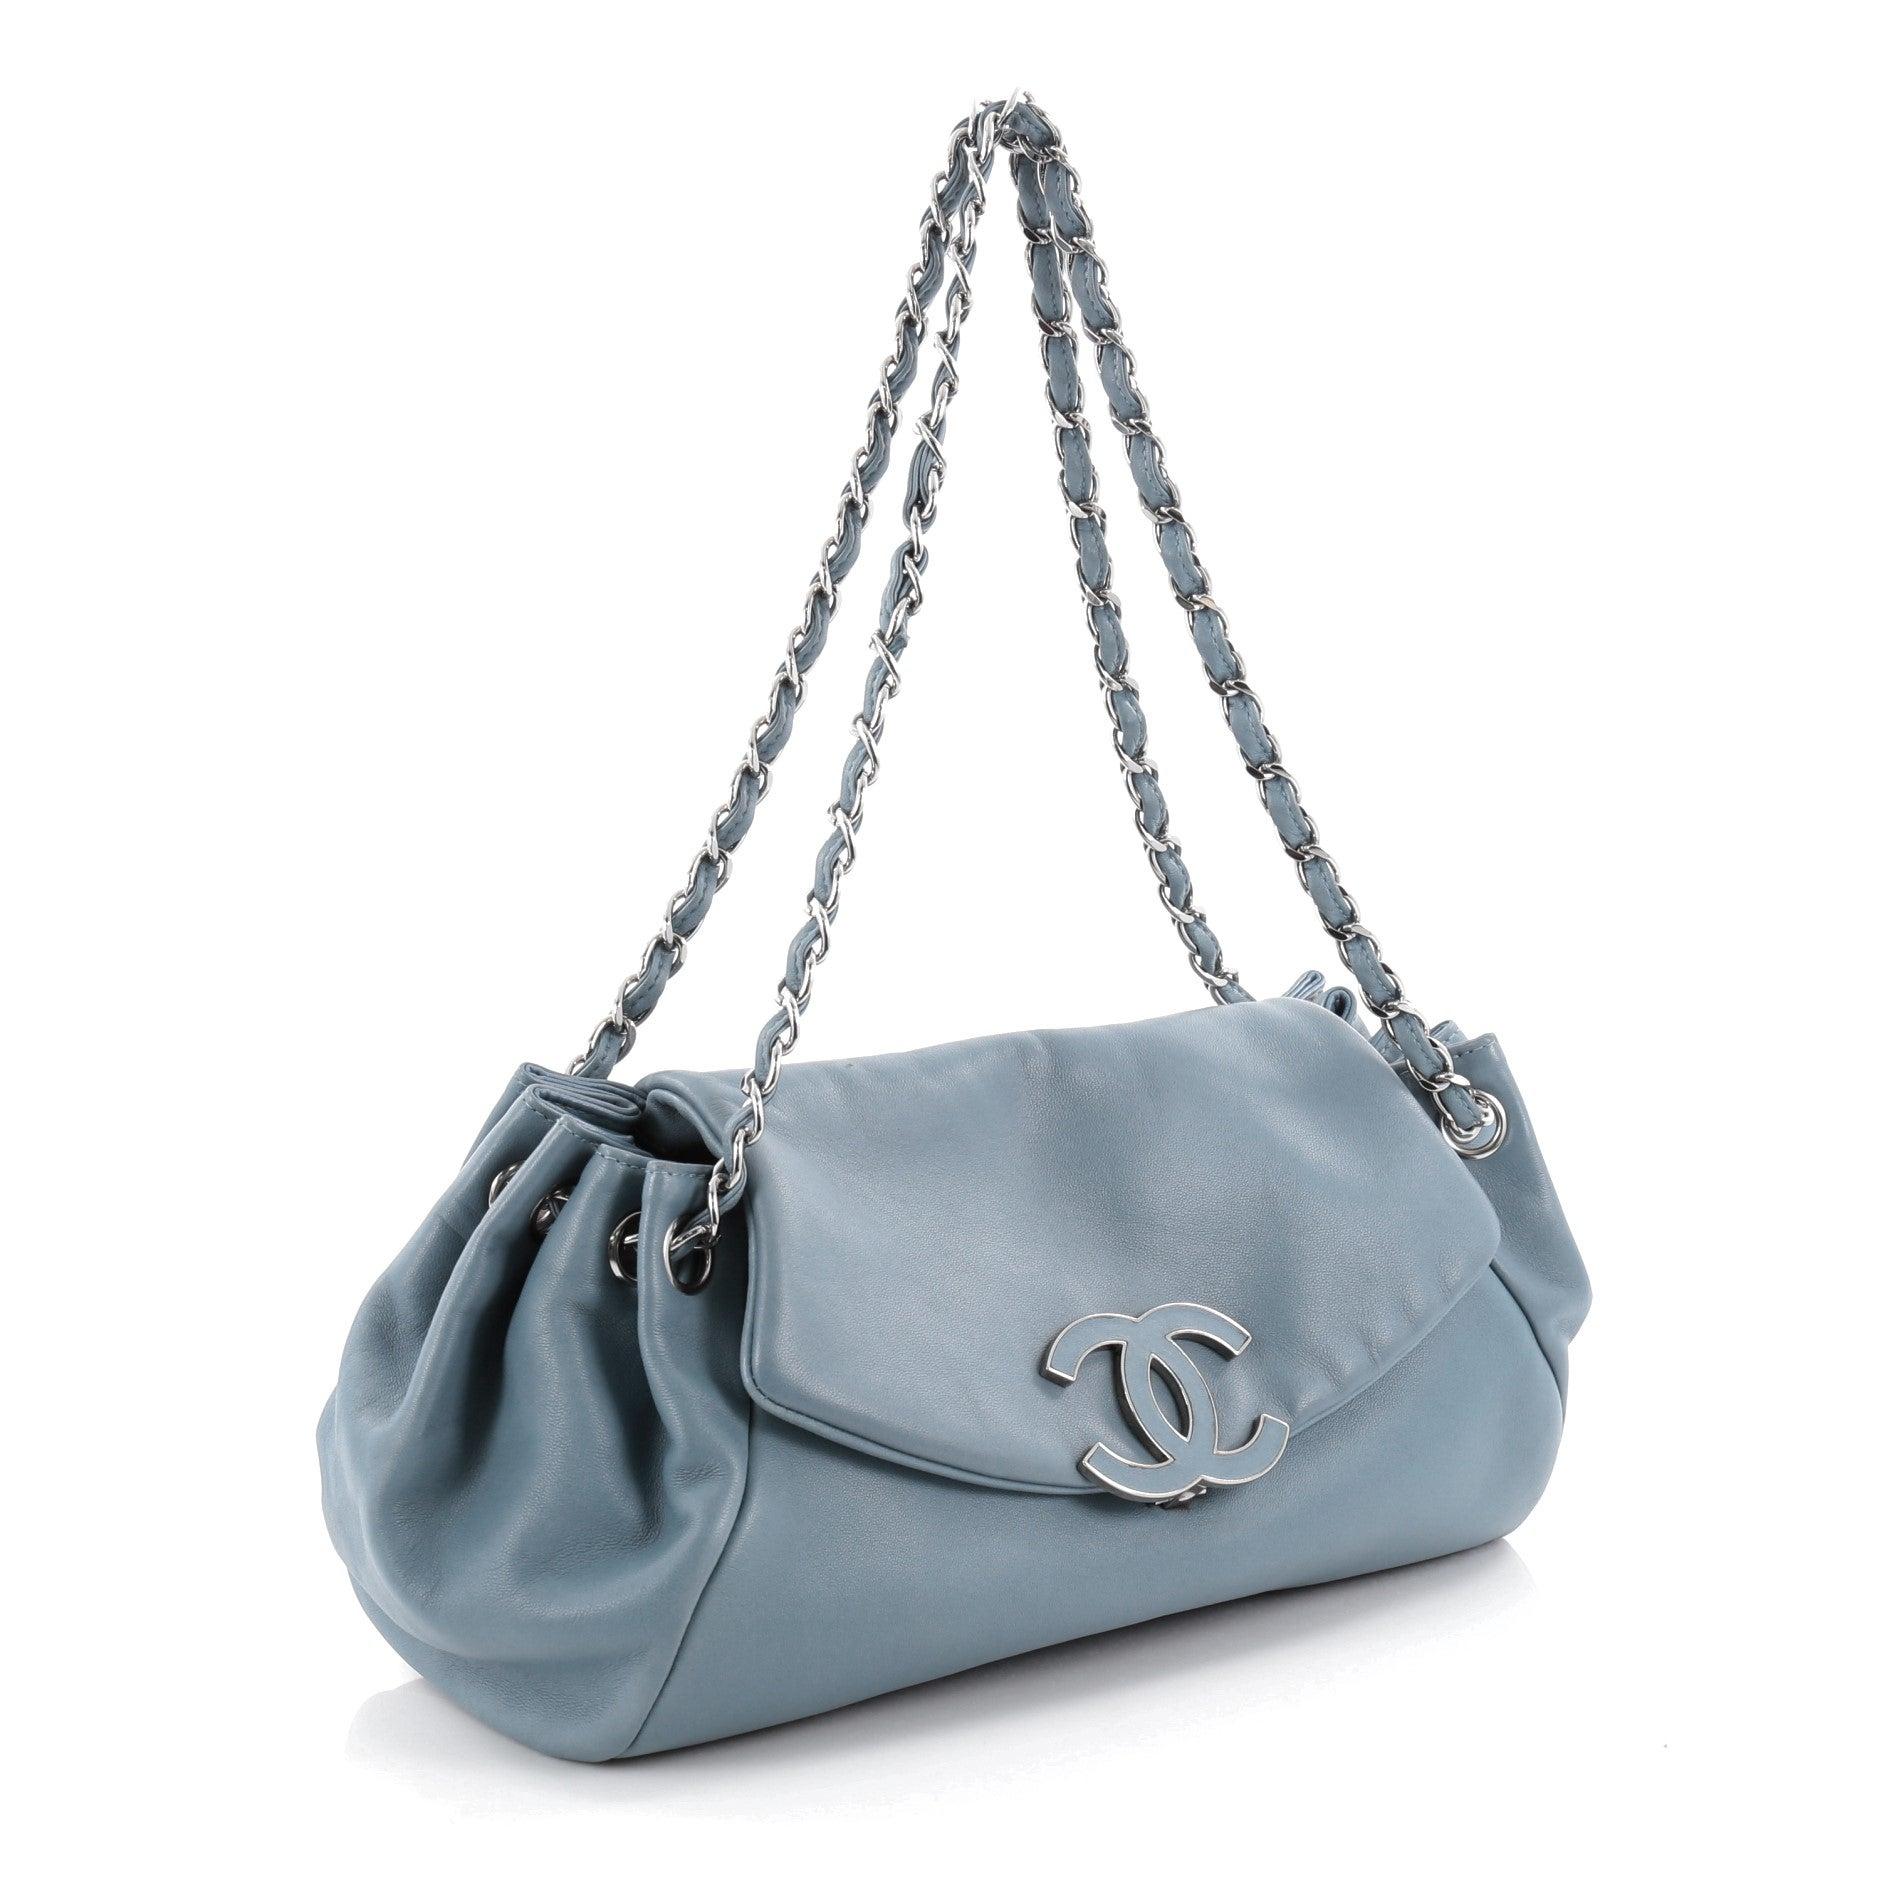 7c1e8251fb26 Chanel Sensual CC Accordion Flap Bag Lambskin Large at 1stdibs